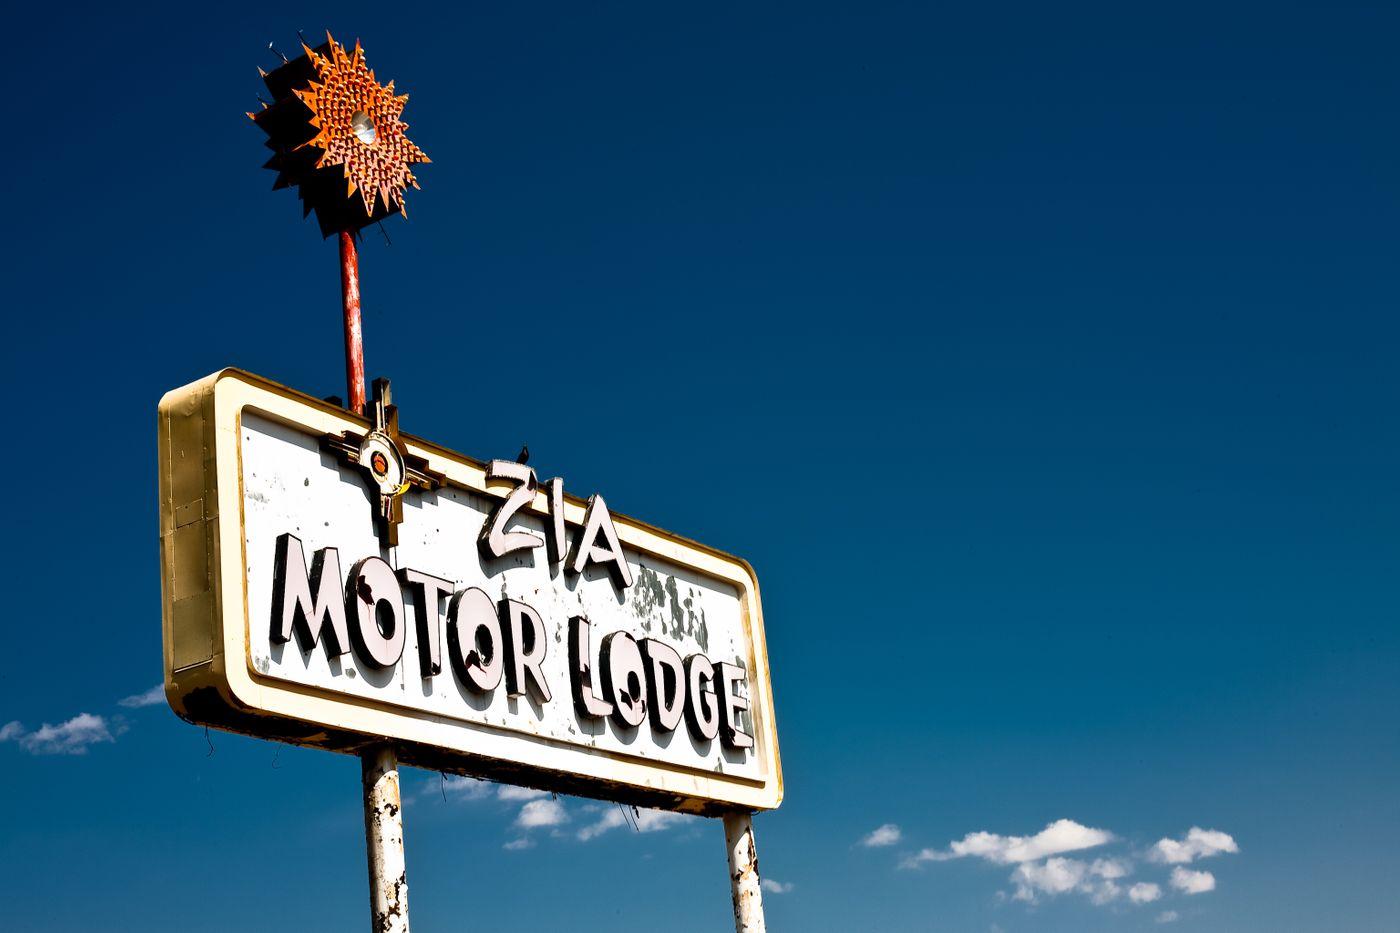 motel-web-2020-jpg-3-PRINT.jpg